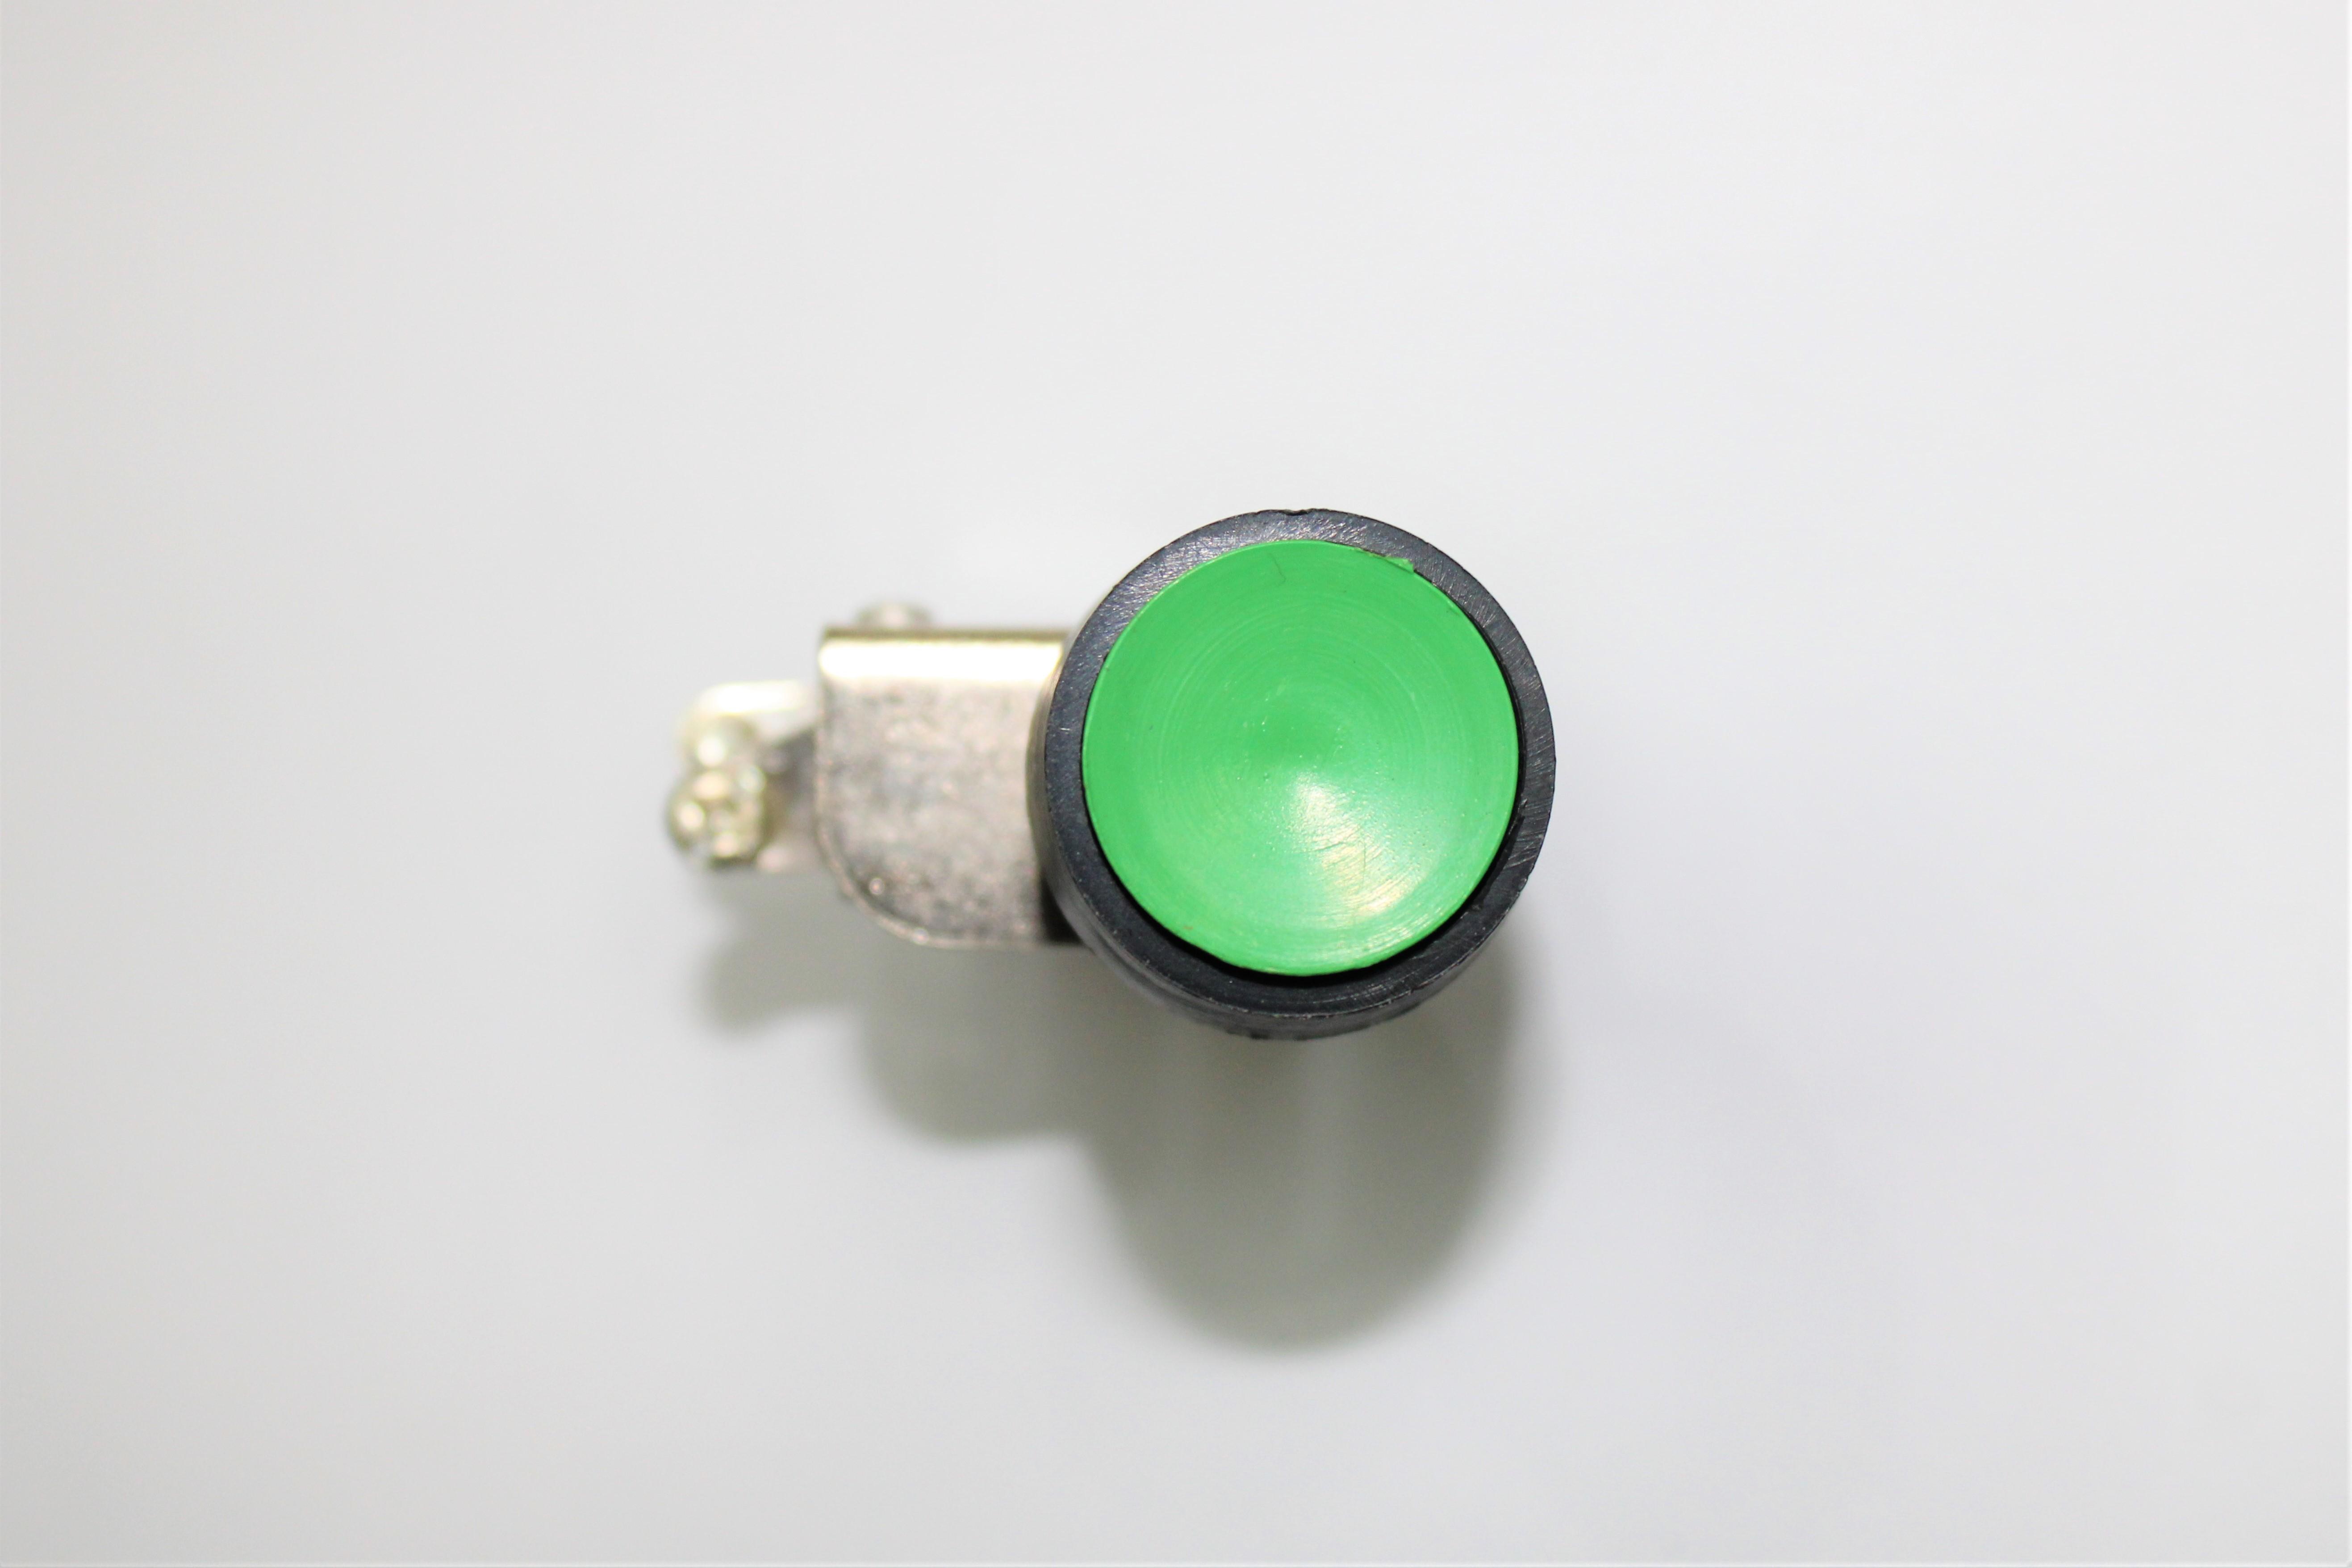 Micro Switch Thump Push